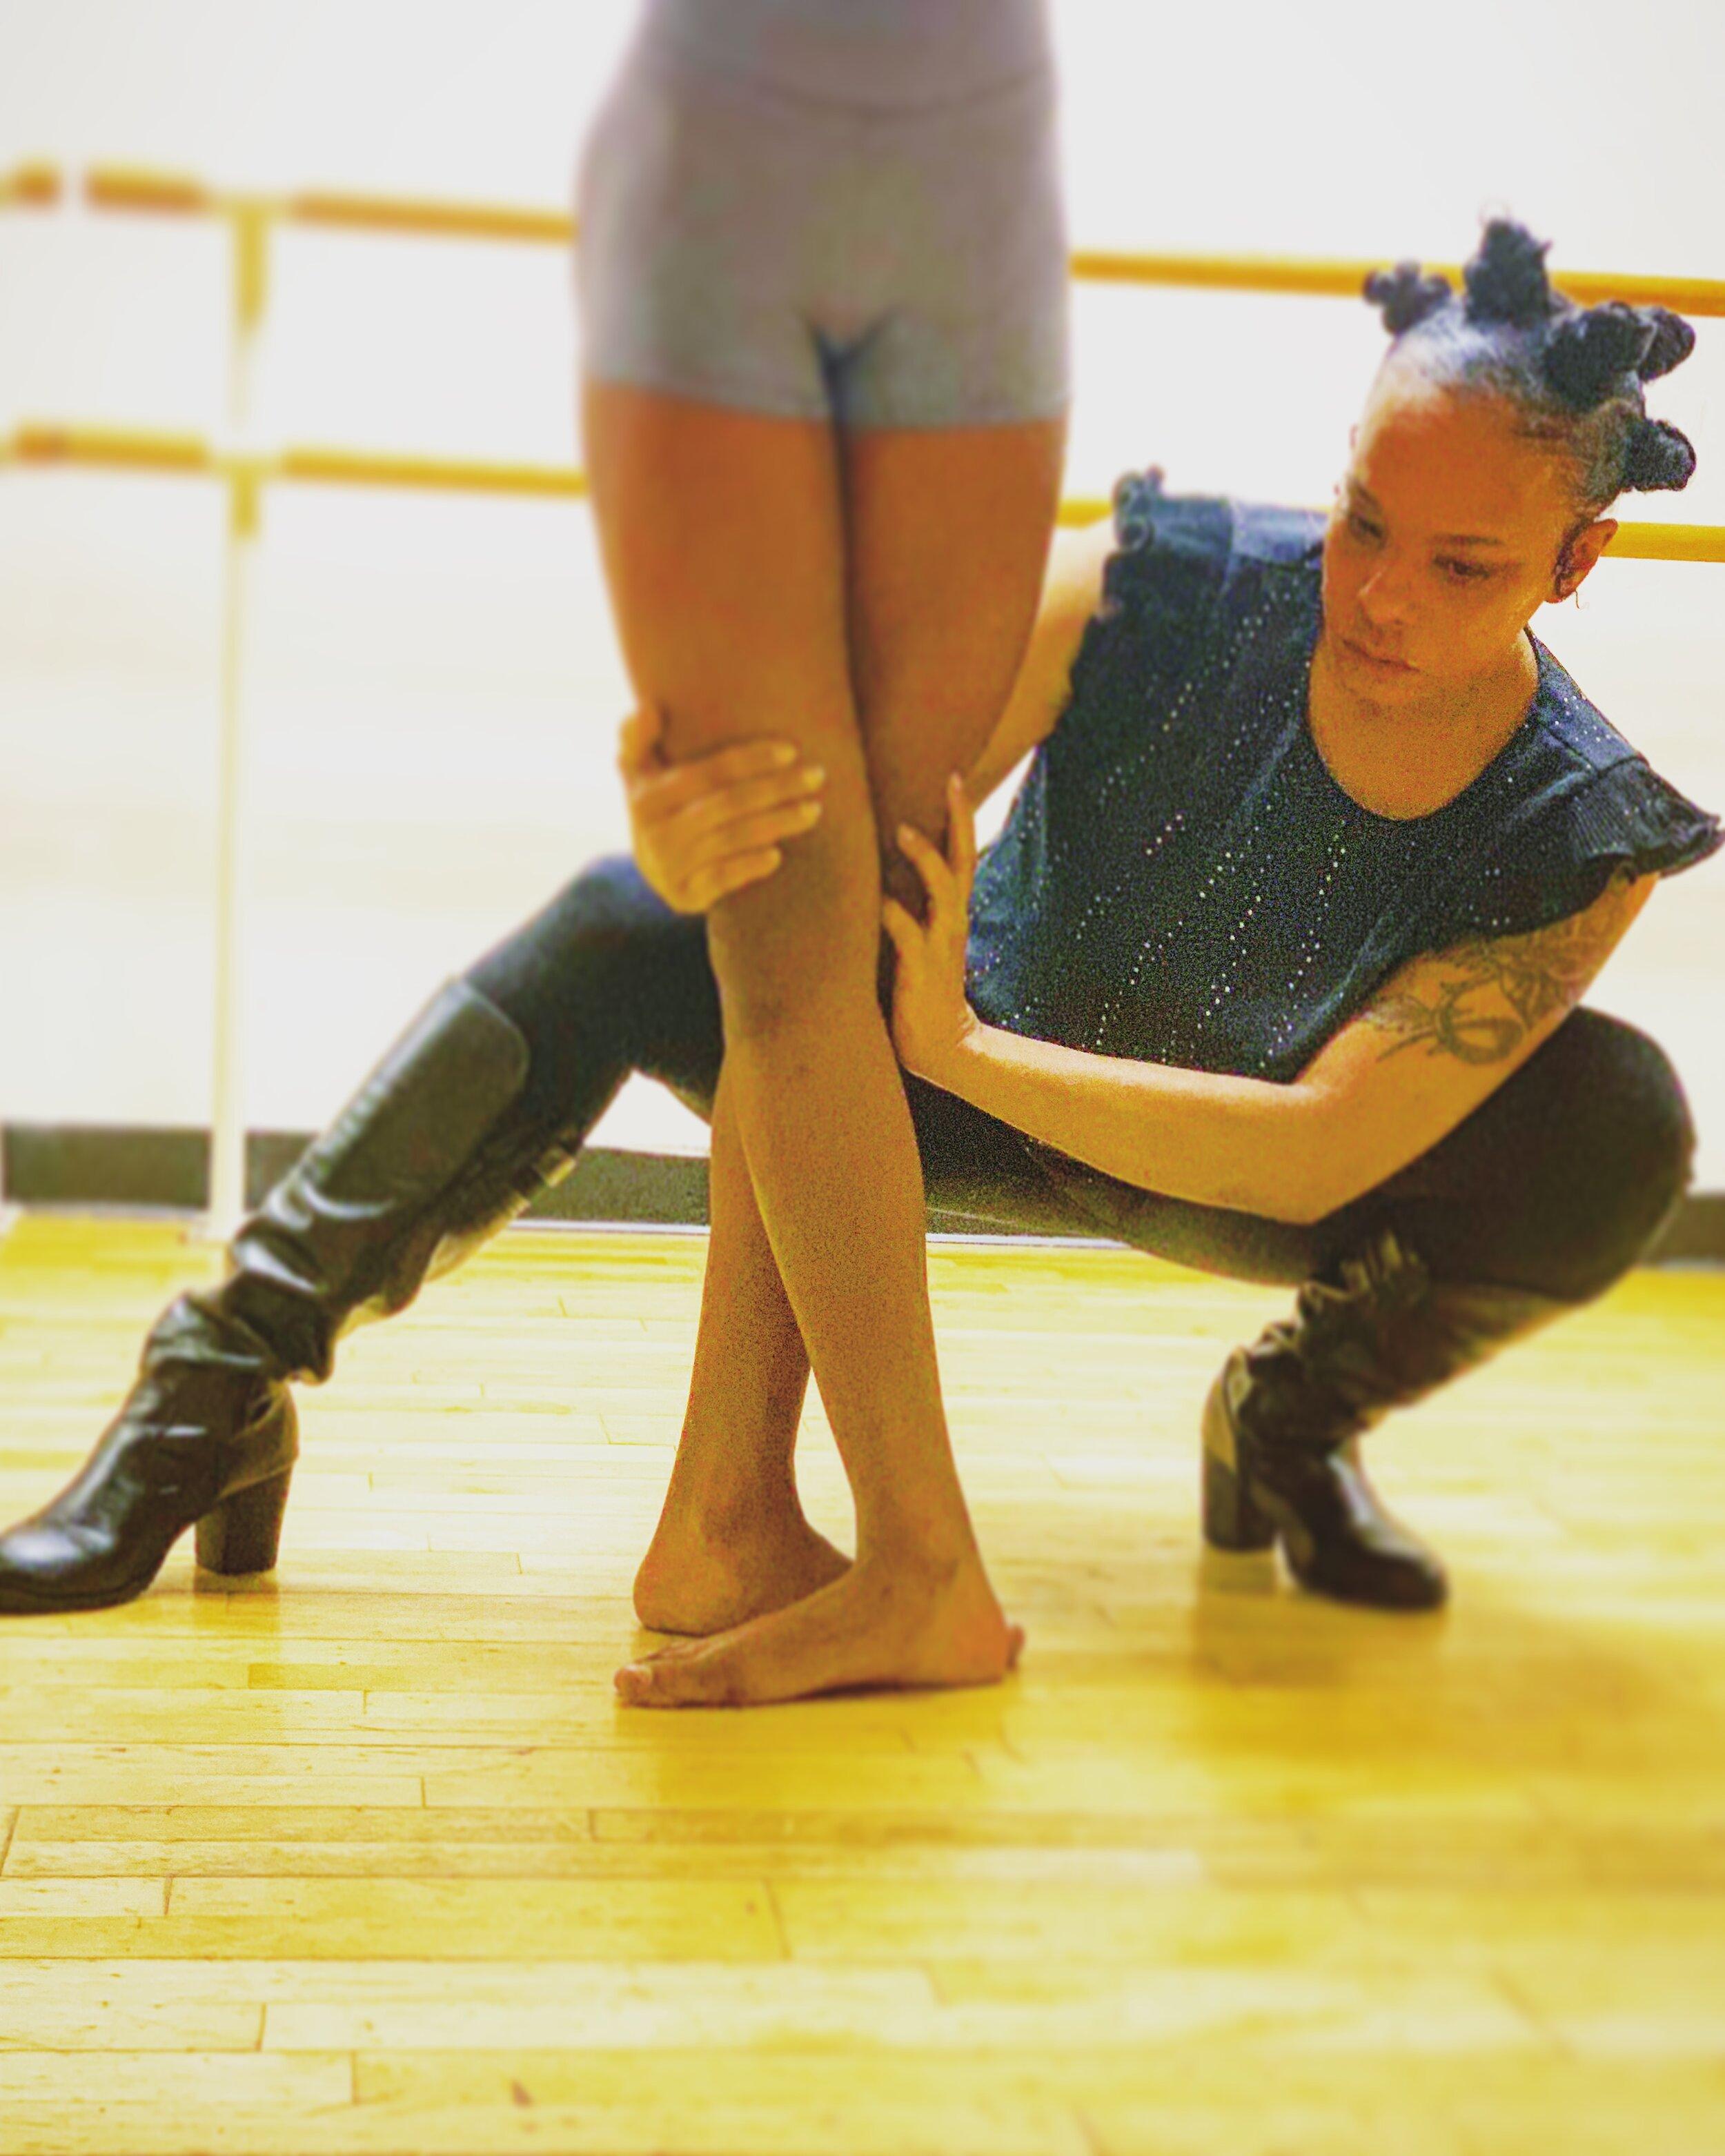 Kerri Edge educating on dance at Edge School of the Arts